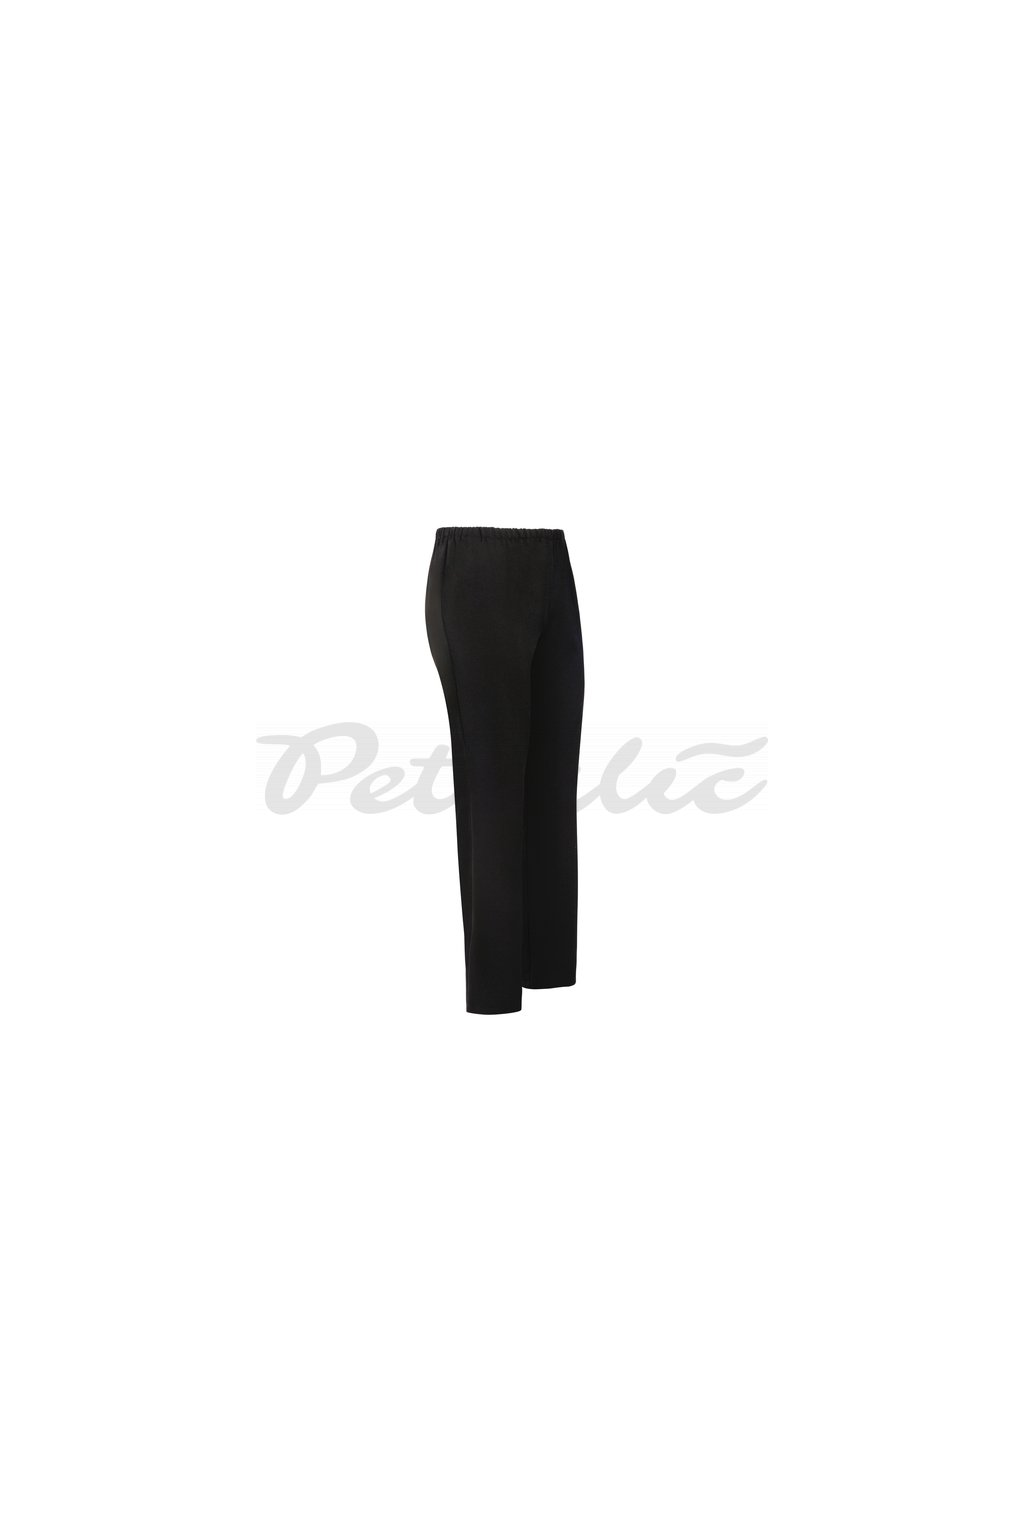 59804 MARCEL kalhoty 7